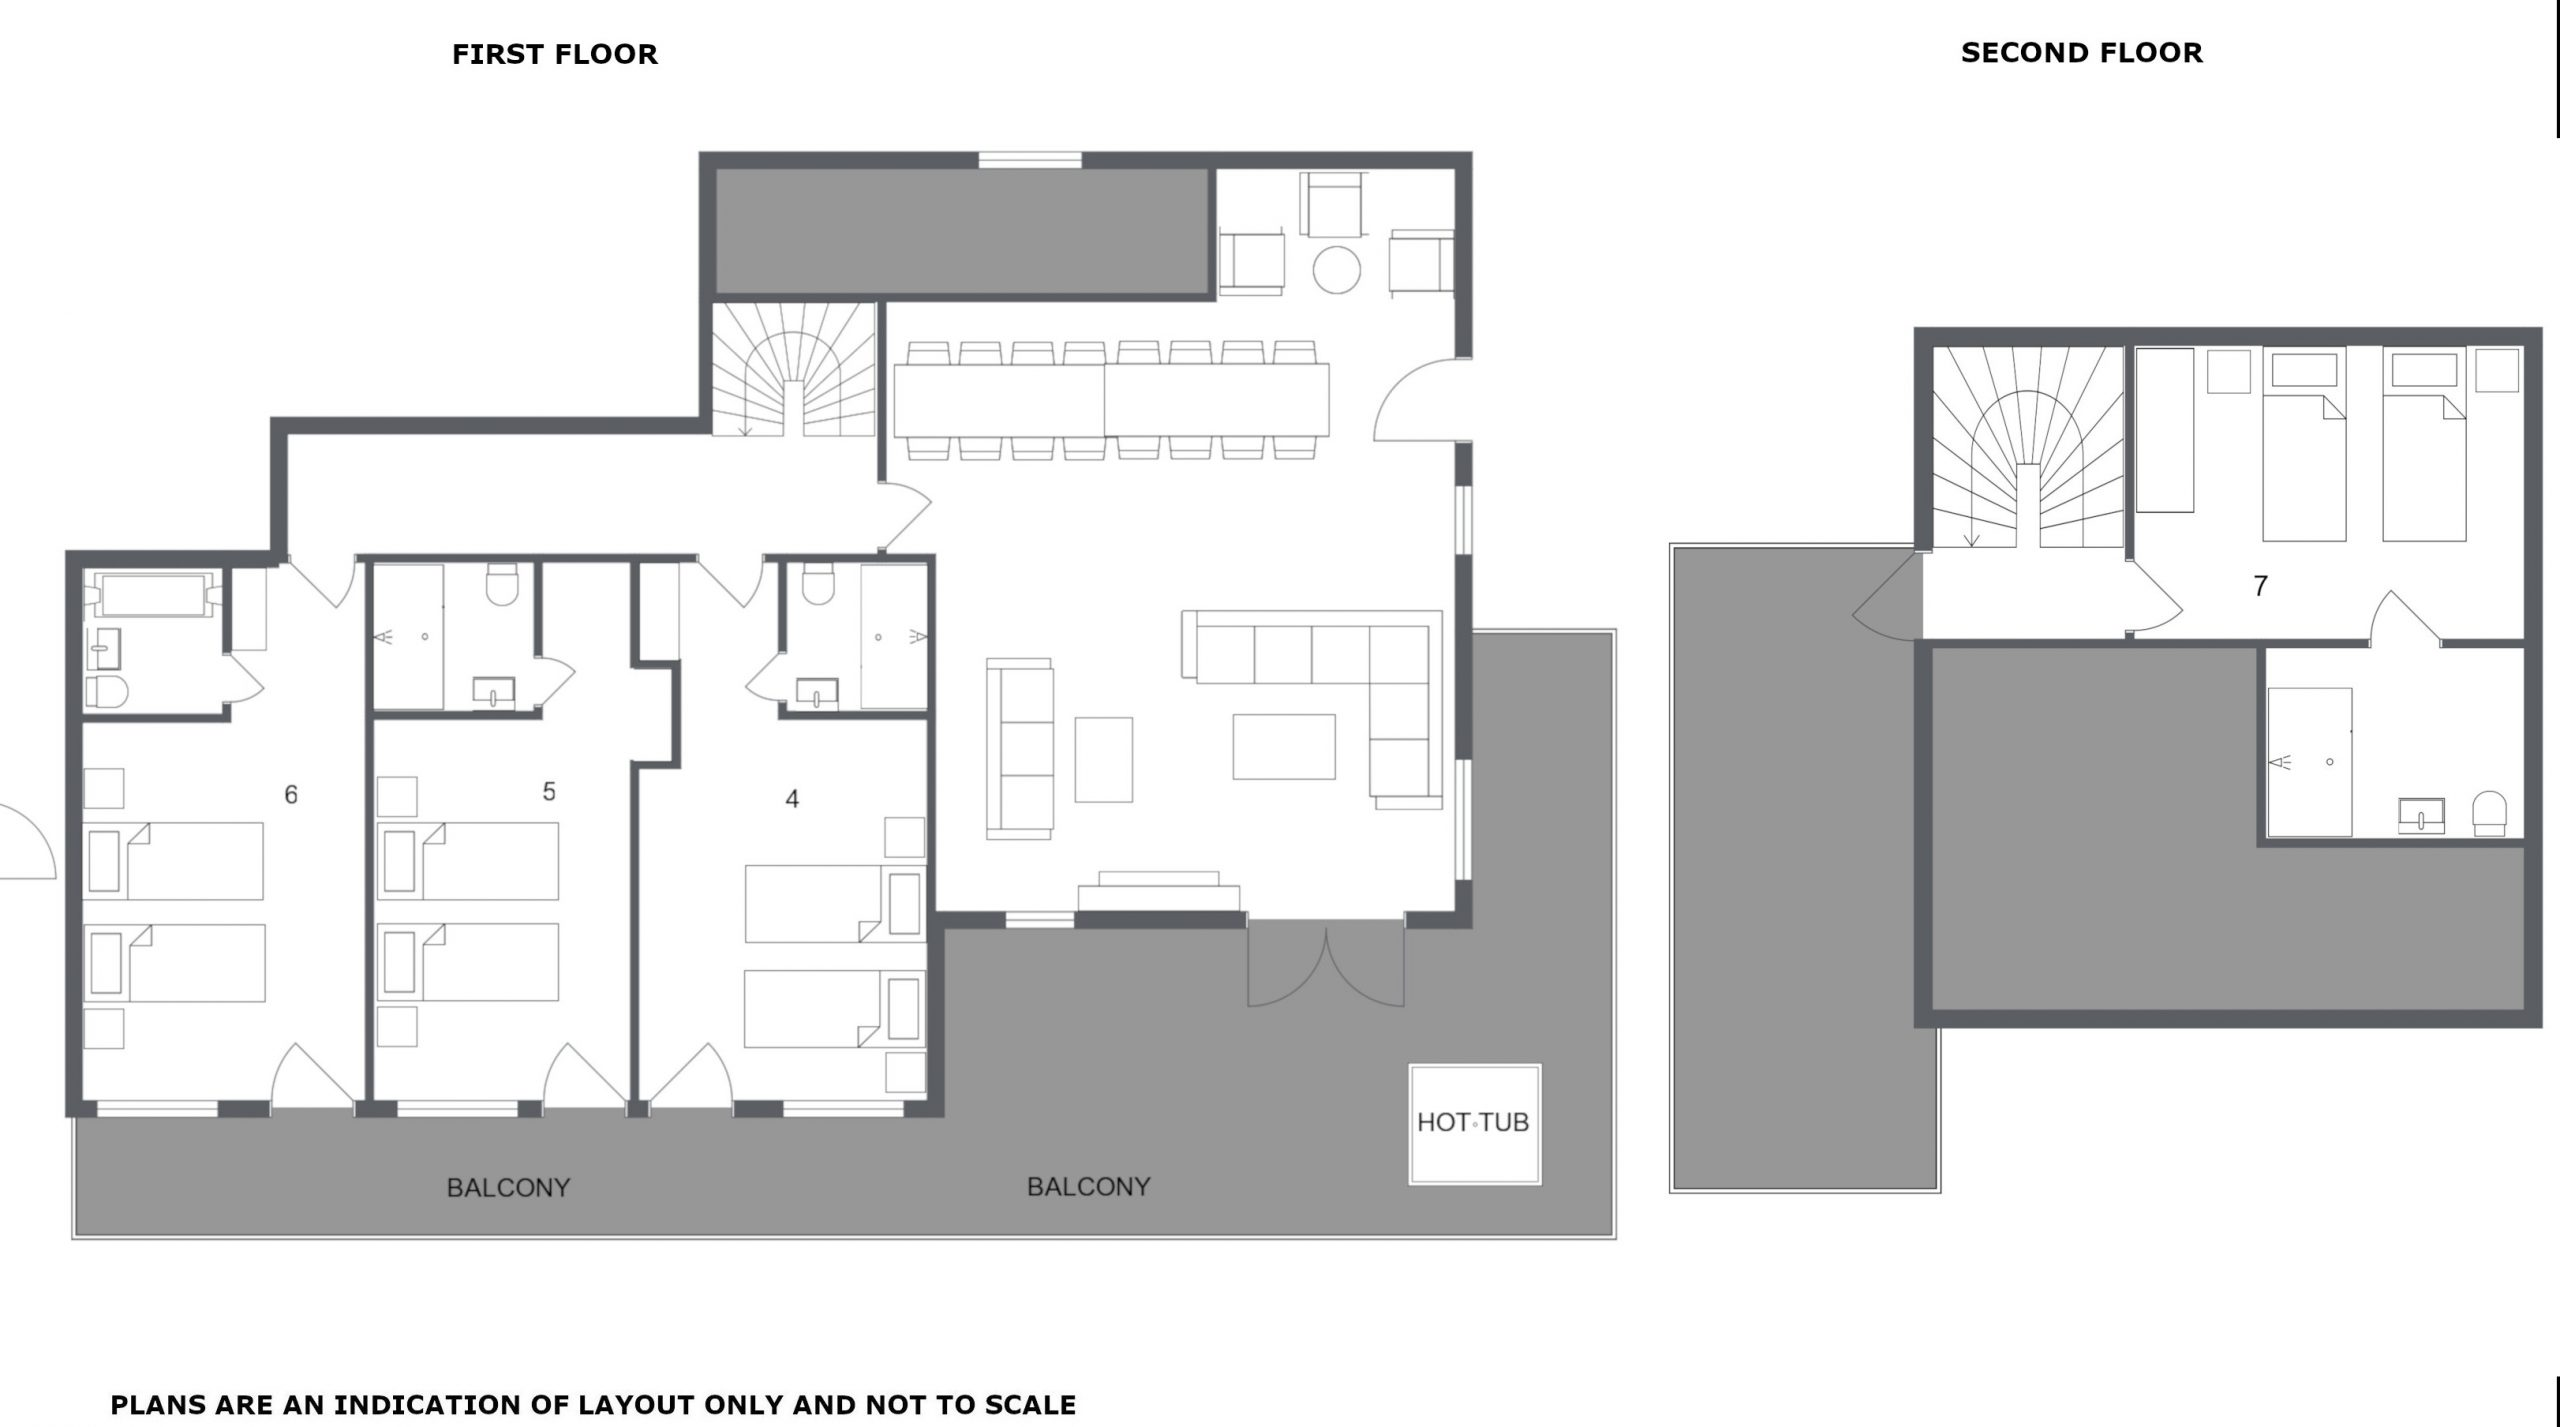 Chalet Chardon Meribel Floor Plan 2